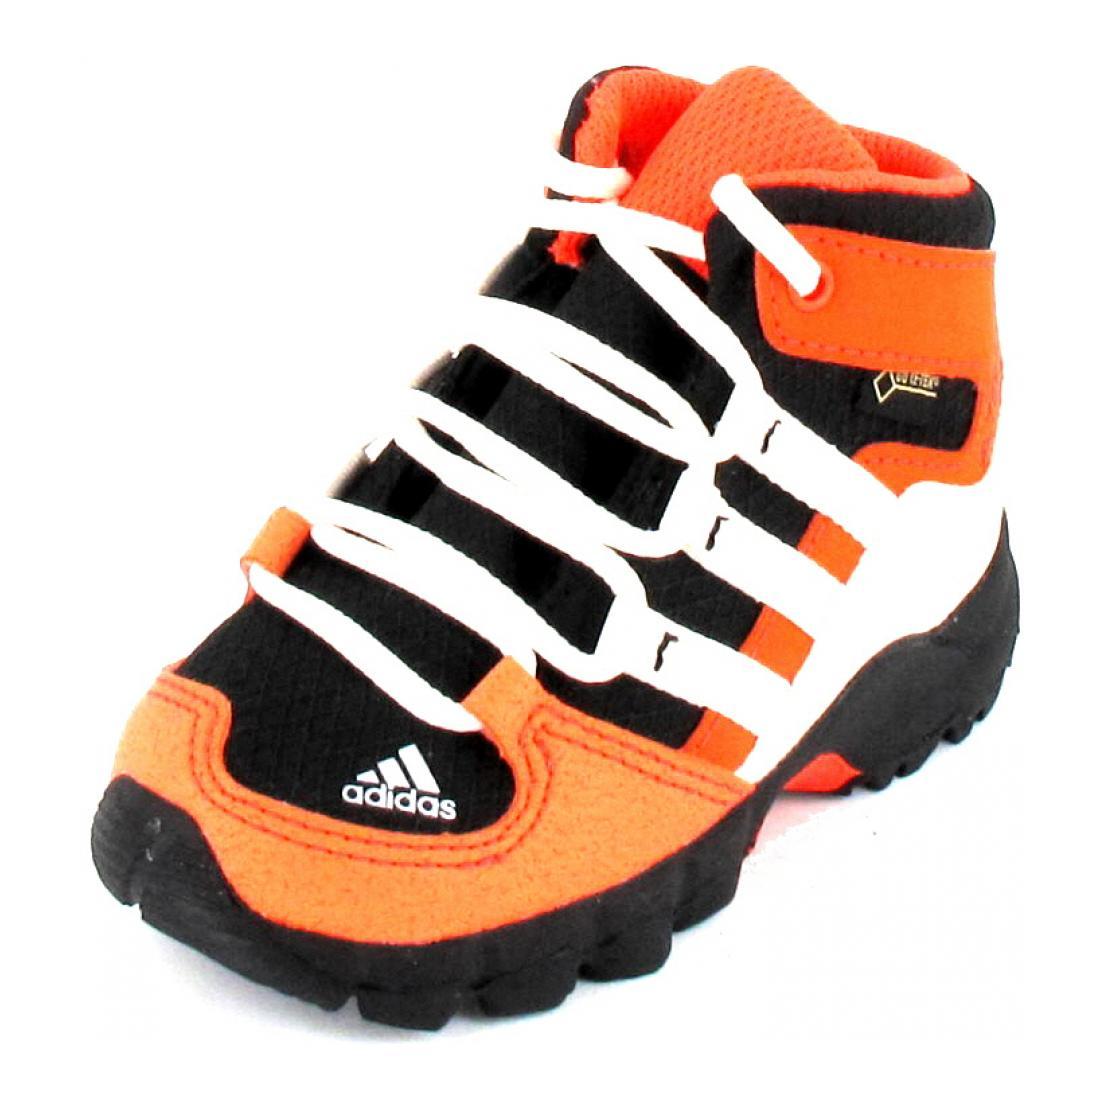 adidas Outdoor Stiefel TERREX MIF GTX I